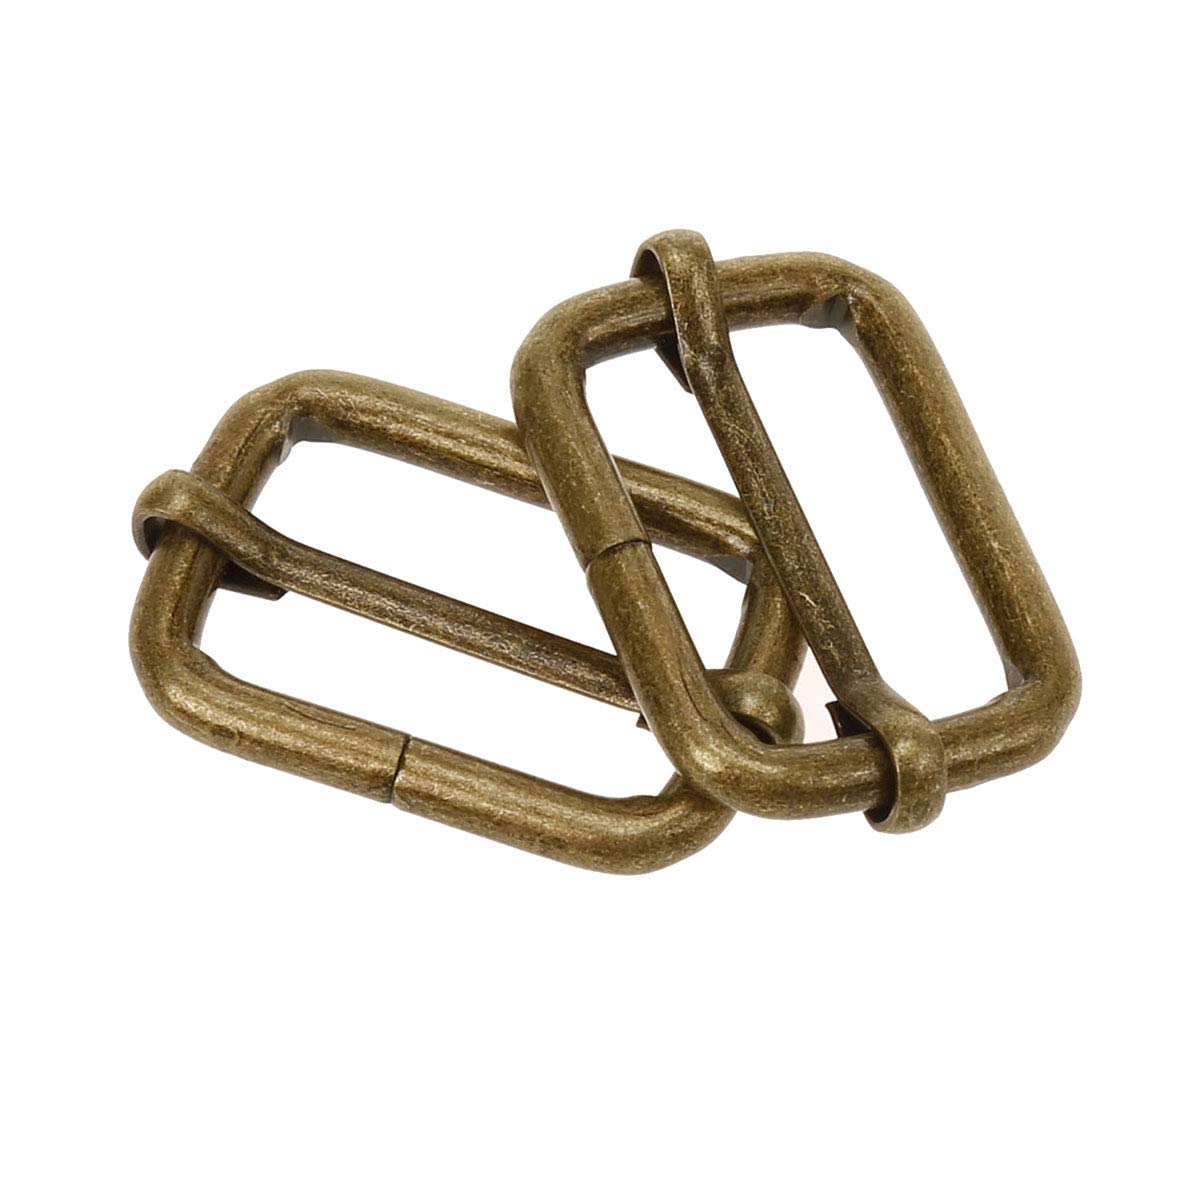 3//4 inch COTOWIN Adjustable Metal Slide Rectangle Buckle,Pack of 20,